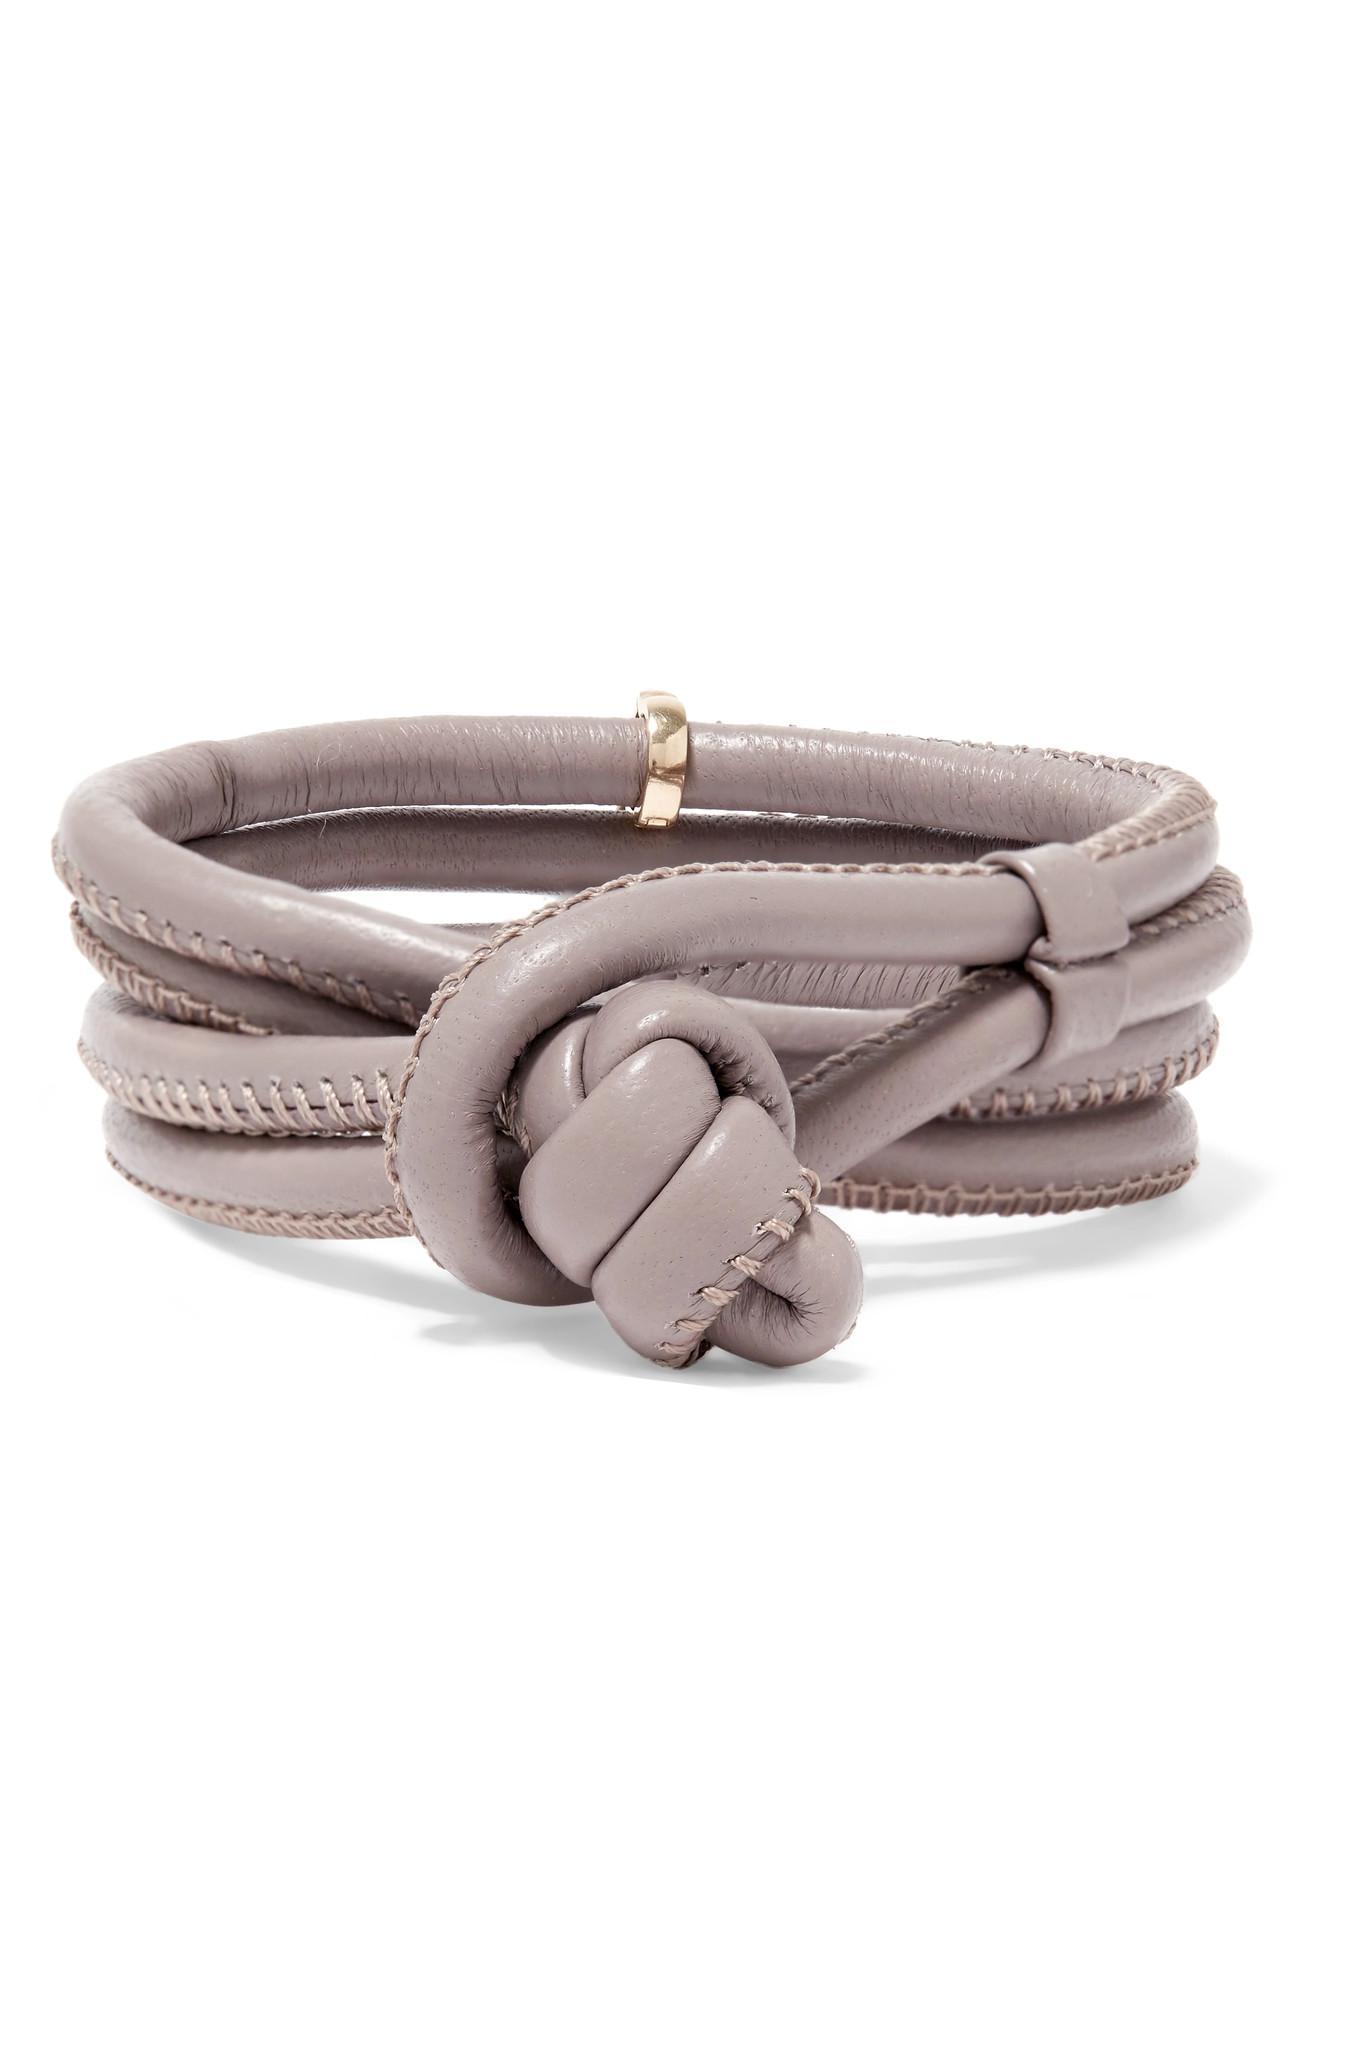 Mizuki 14-karat Gold, Leather And Pearl Wrap Bracelet - Gray